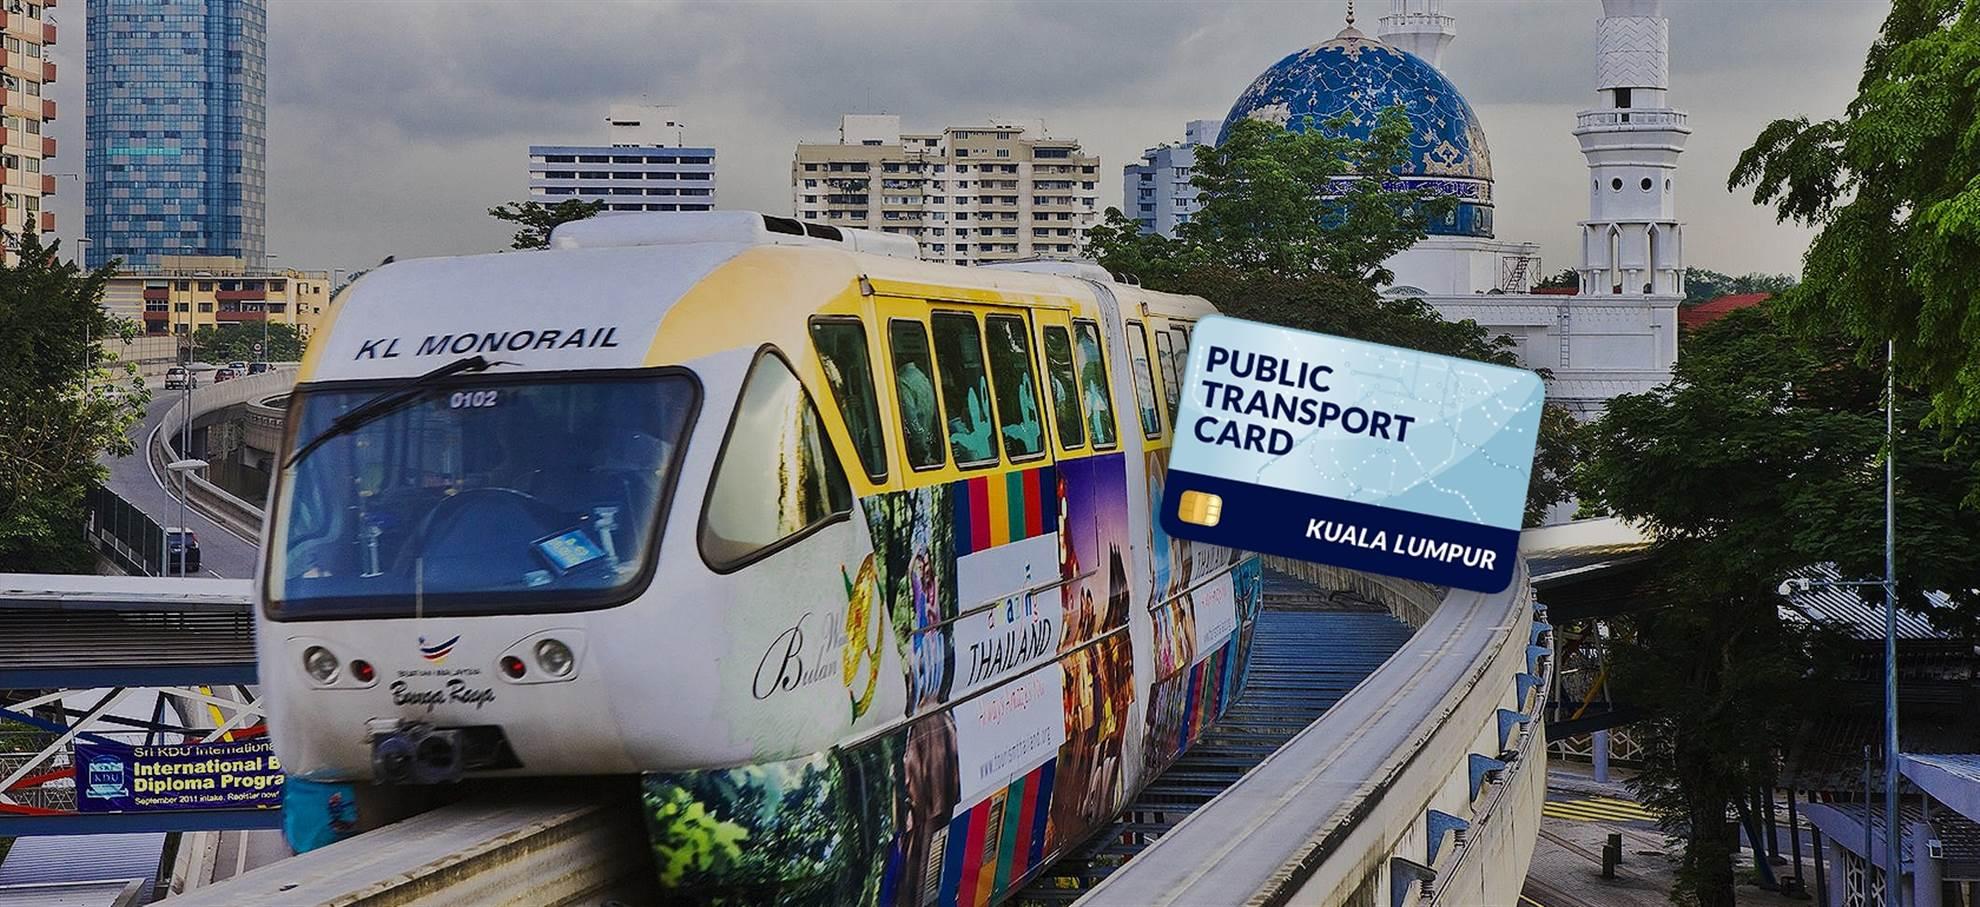 Kuala Lumpur Travel Card